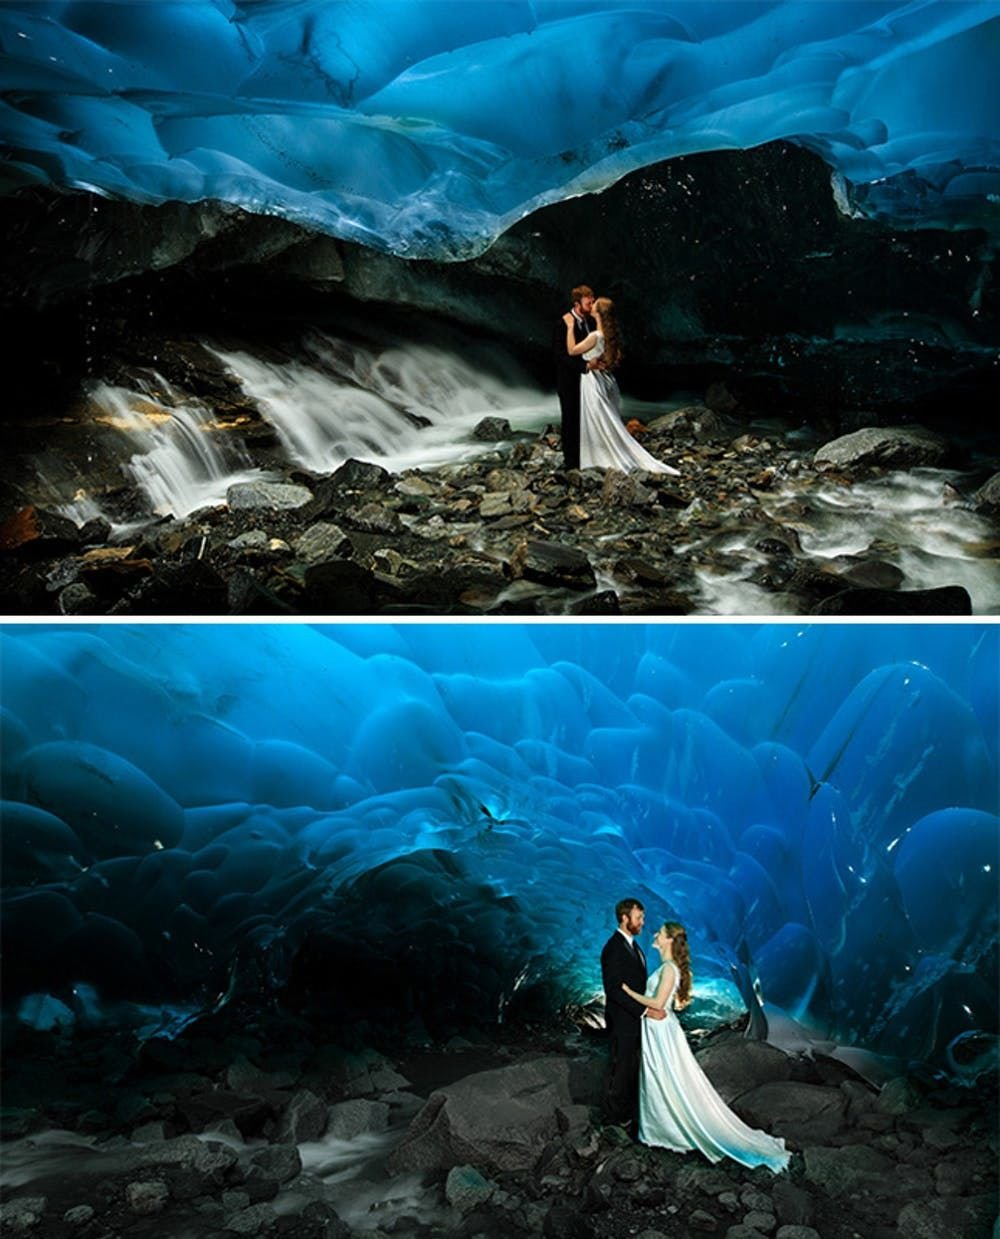 Alaskan Ice Cave